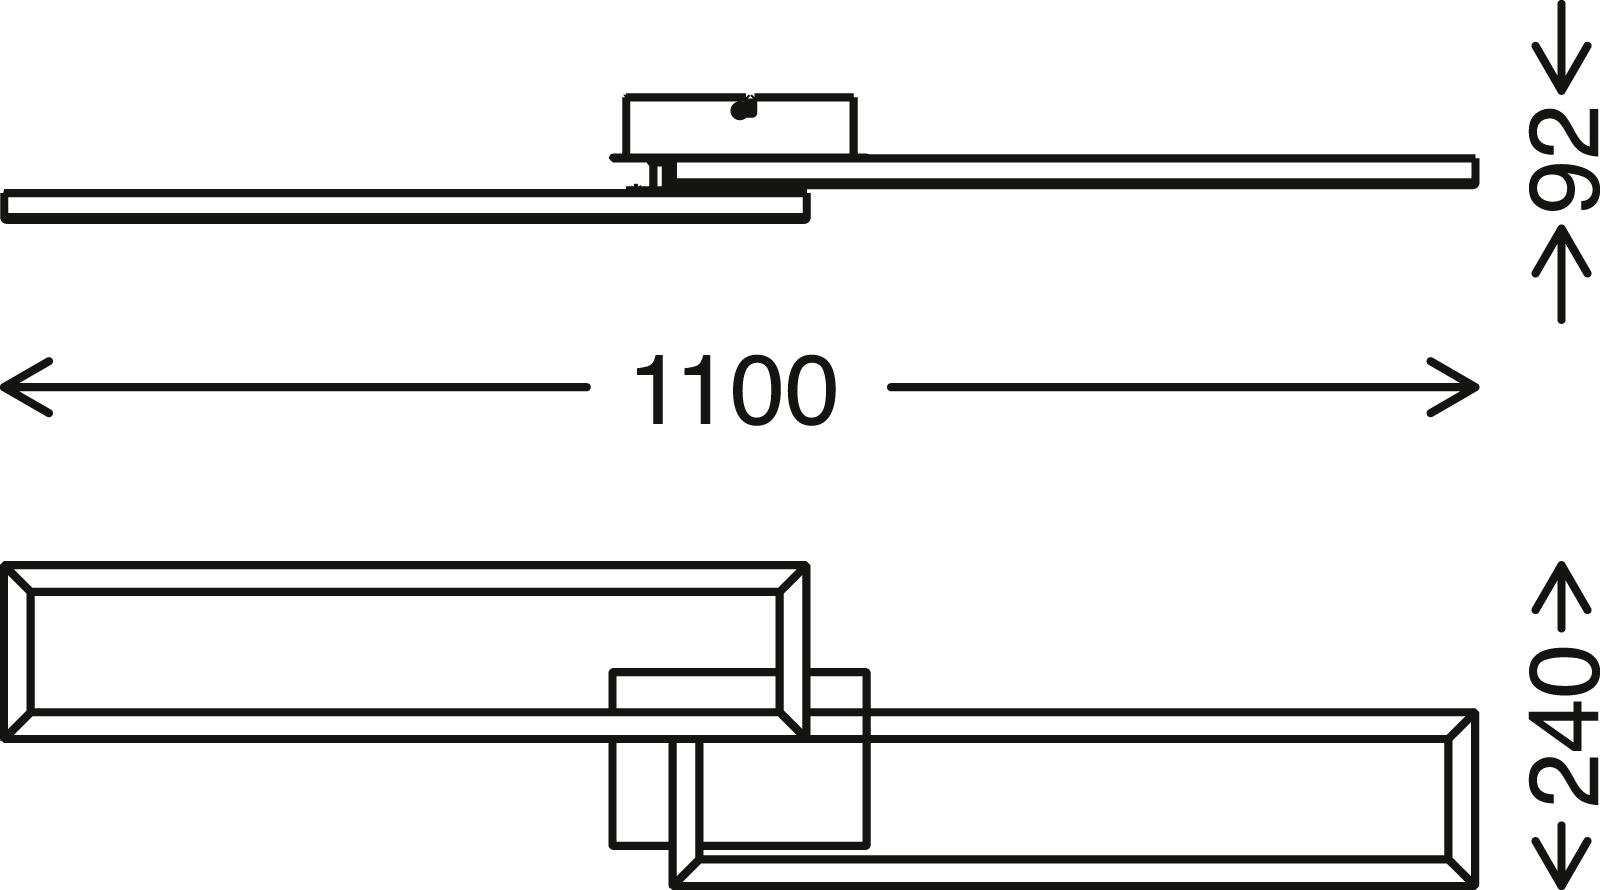 TELEFUNKEN Smart LED Deckenleuchte, 110 cm, 40 W, Chrom-Alu